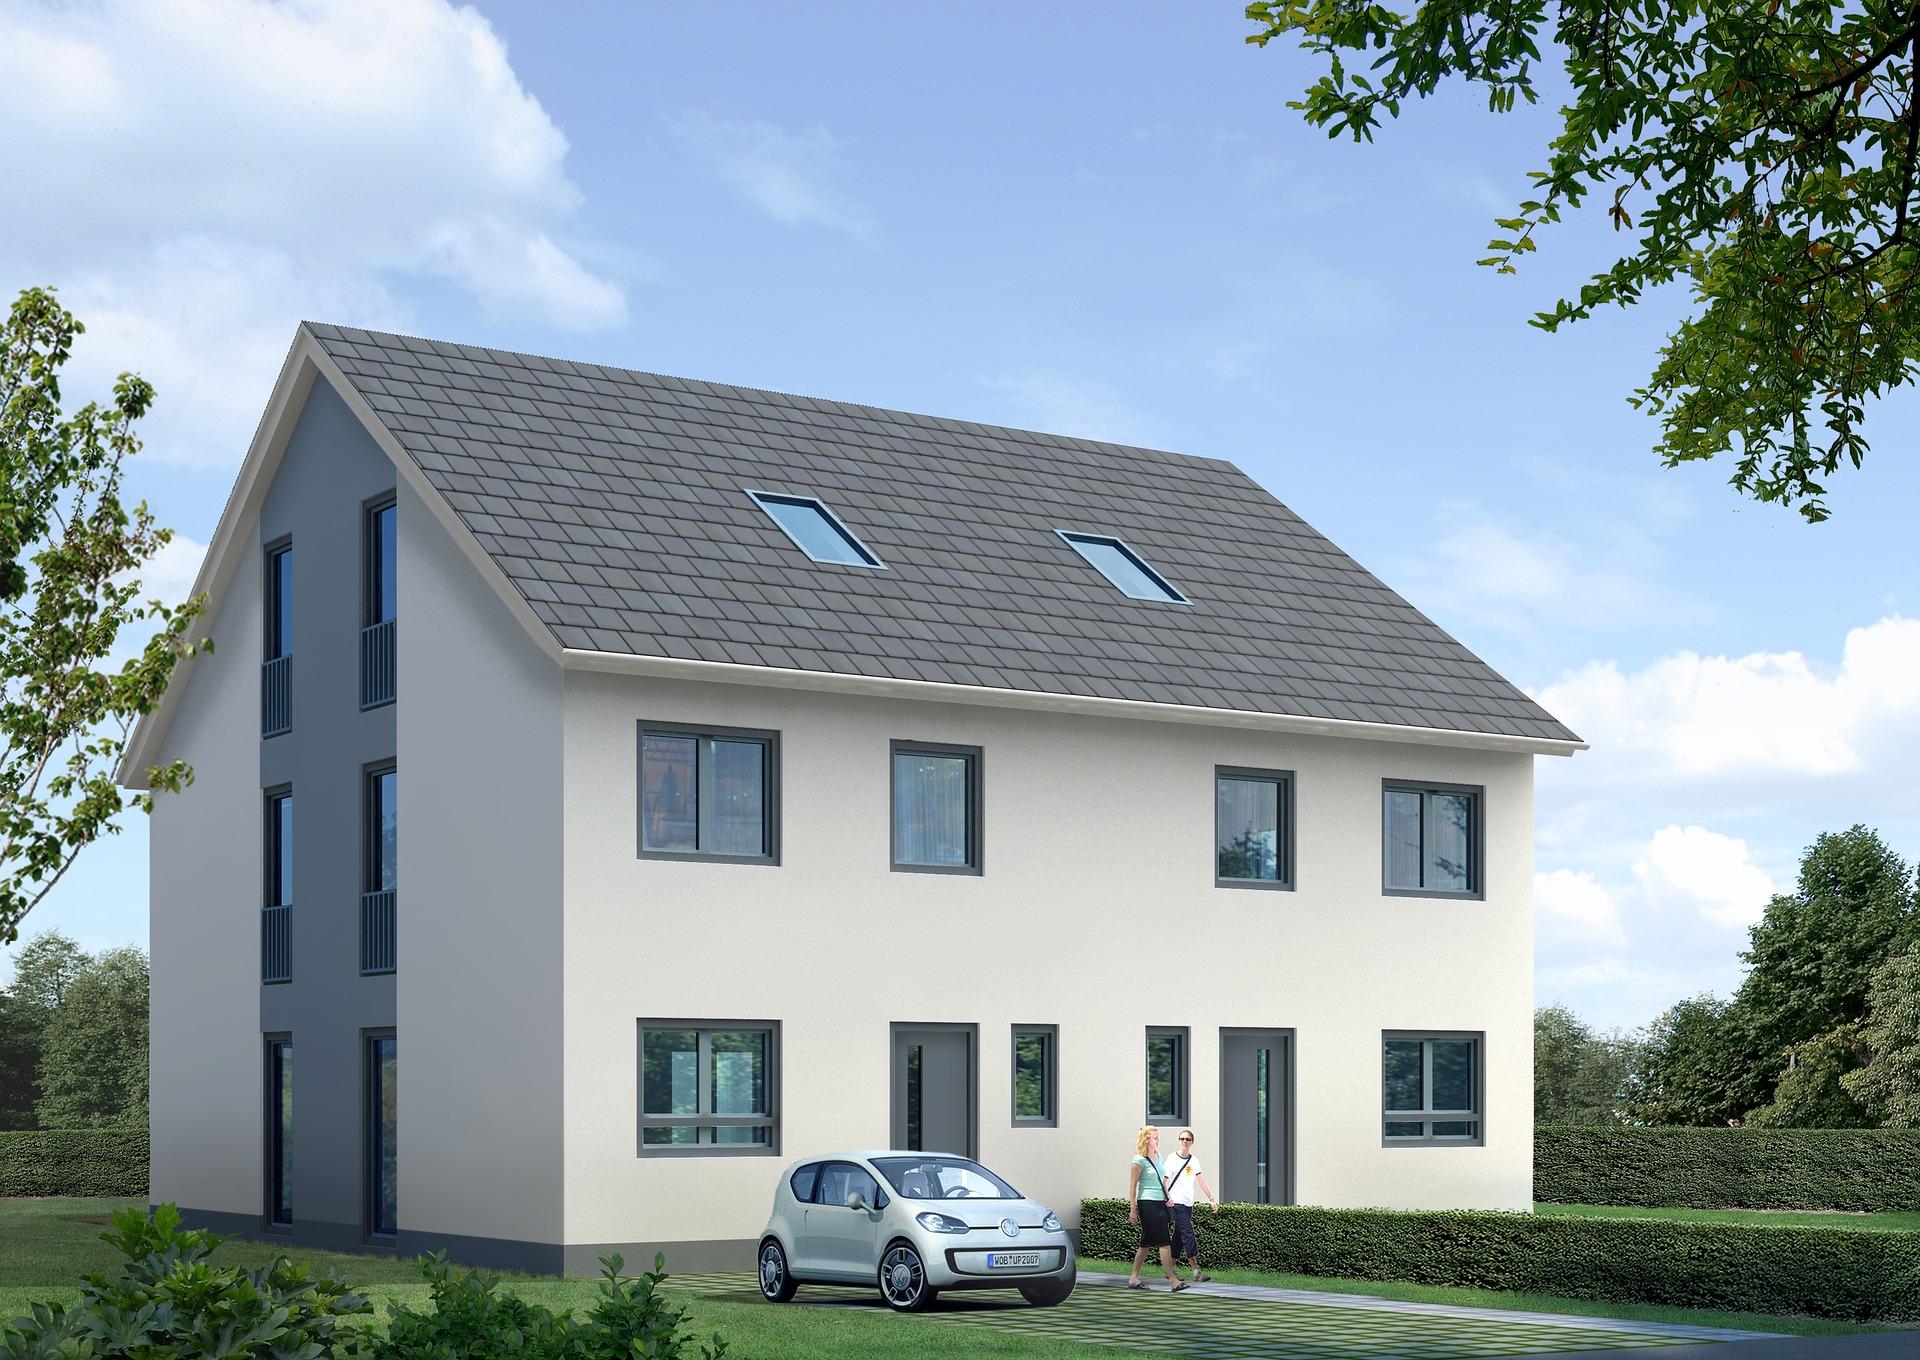 semi-detached-house-1026381_1920